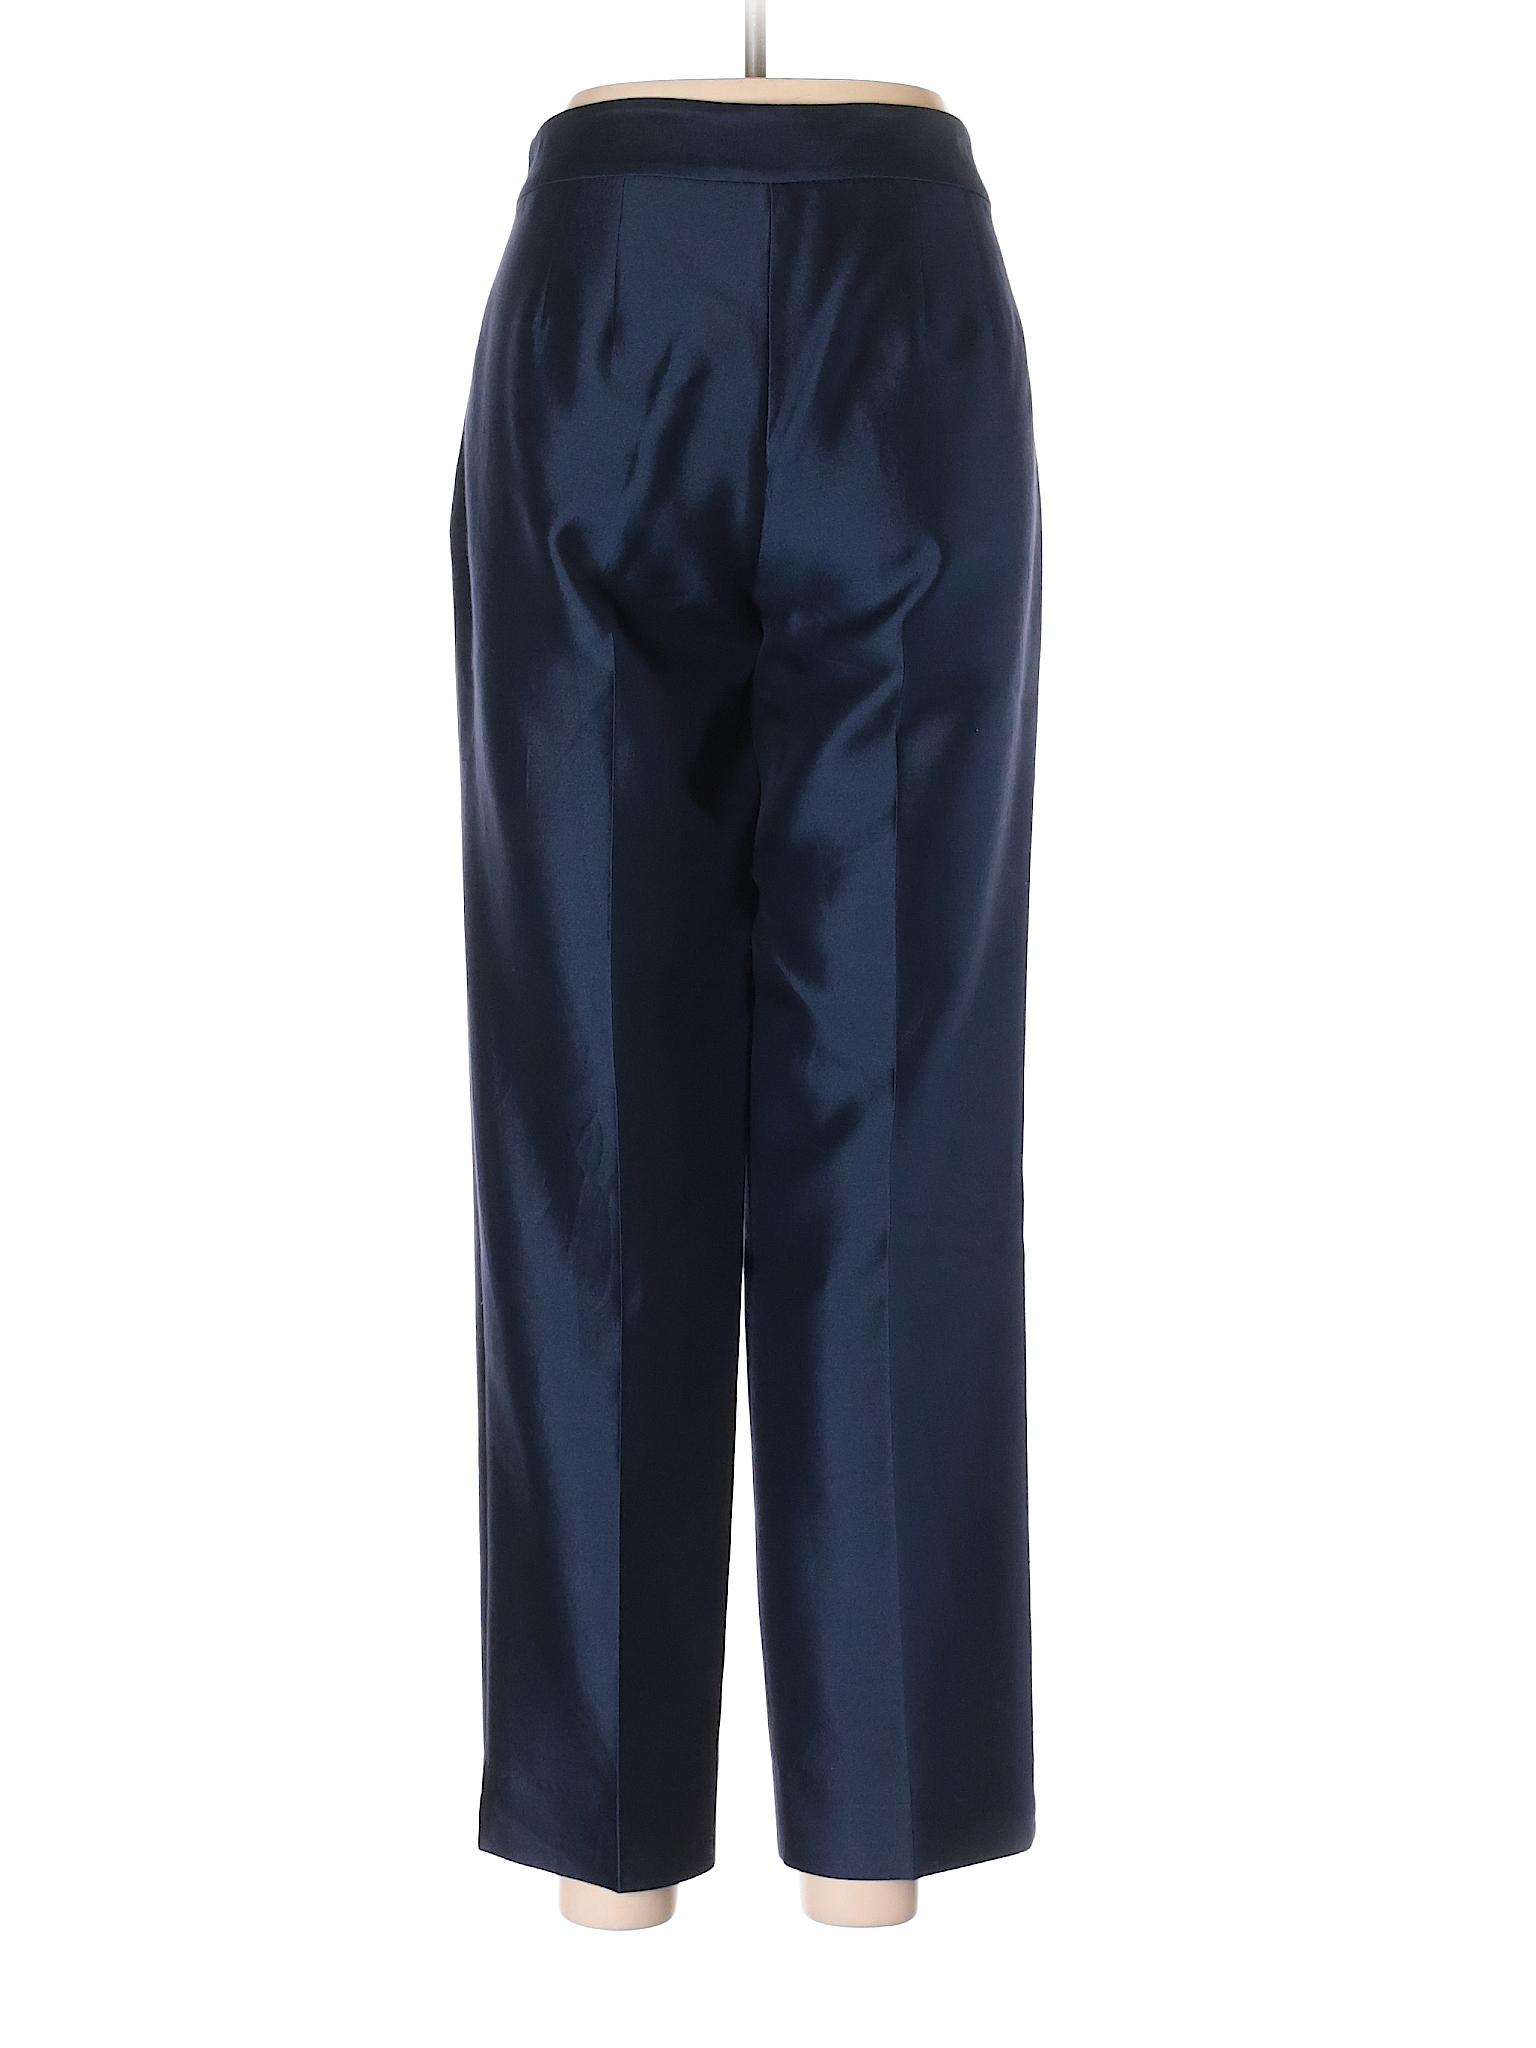 winter Pants Boutique Silk winter Talbots Boutique winter winter Boutique Talbots Pants Silk Talbots Pants Boutique Silk Talbots Silk 6COnzq